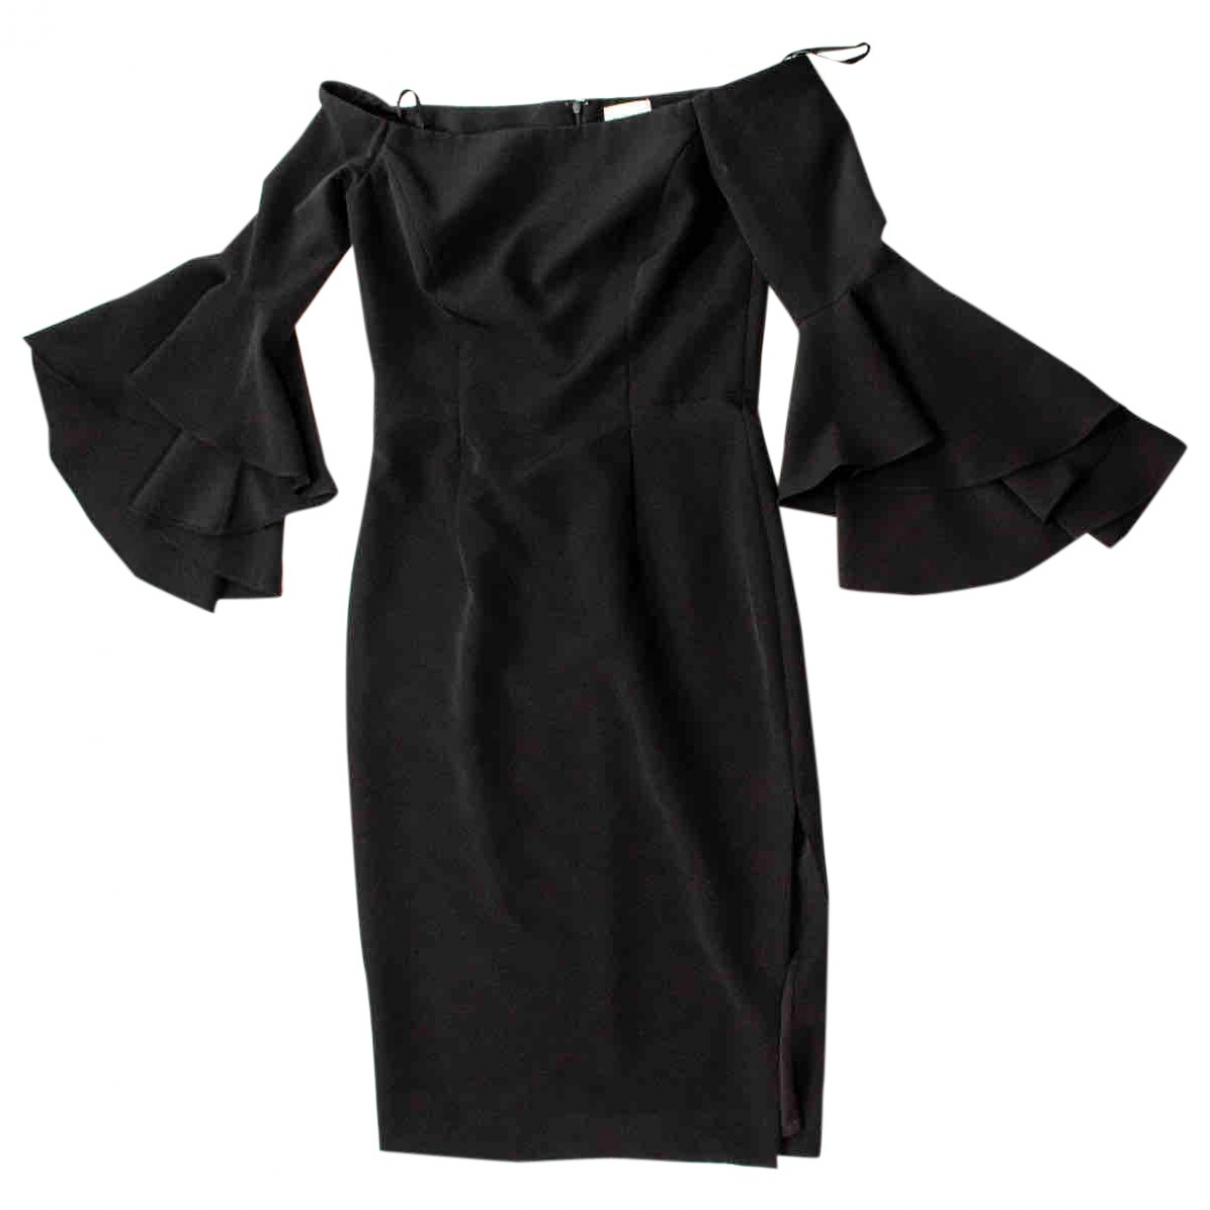 Milly \N Black Pony-style calfskin dress for Women 8 US